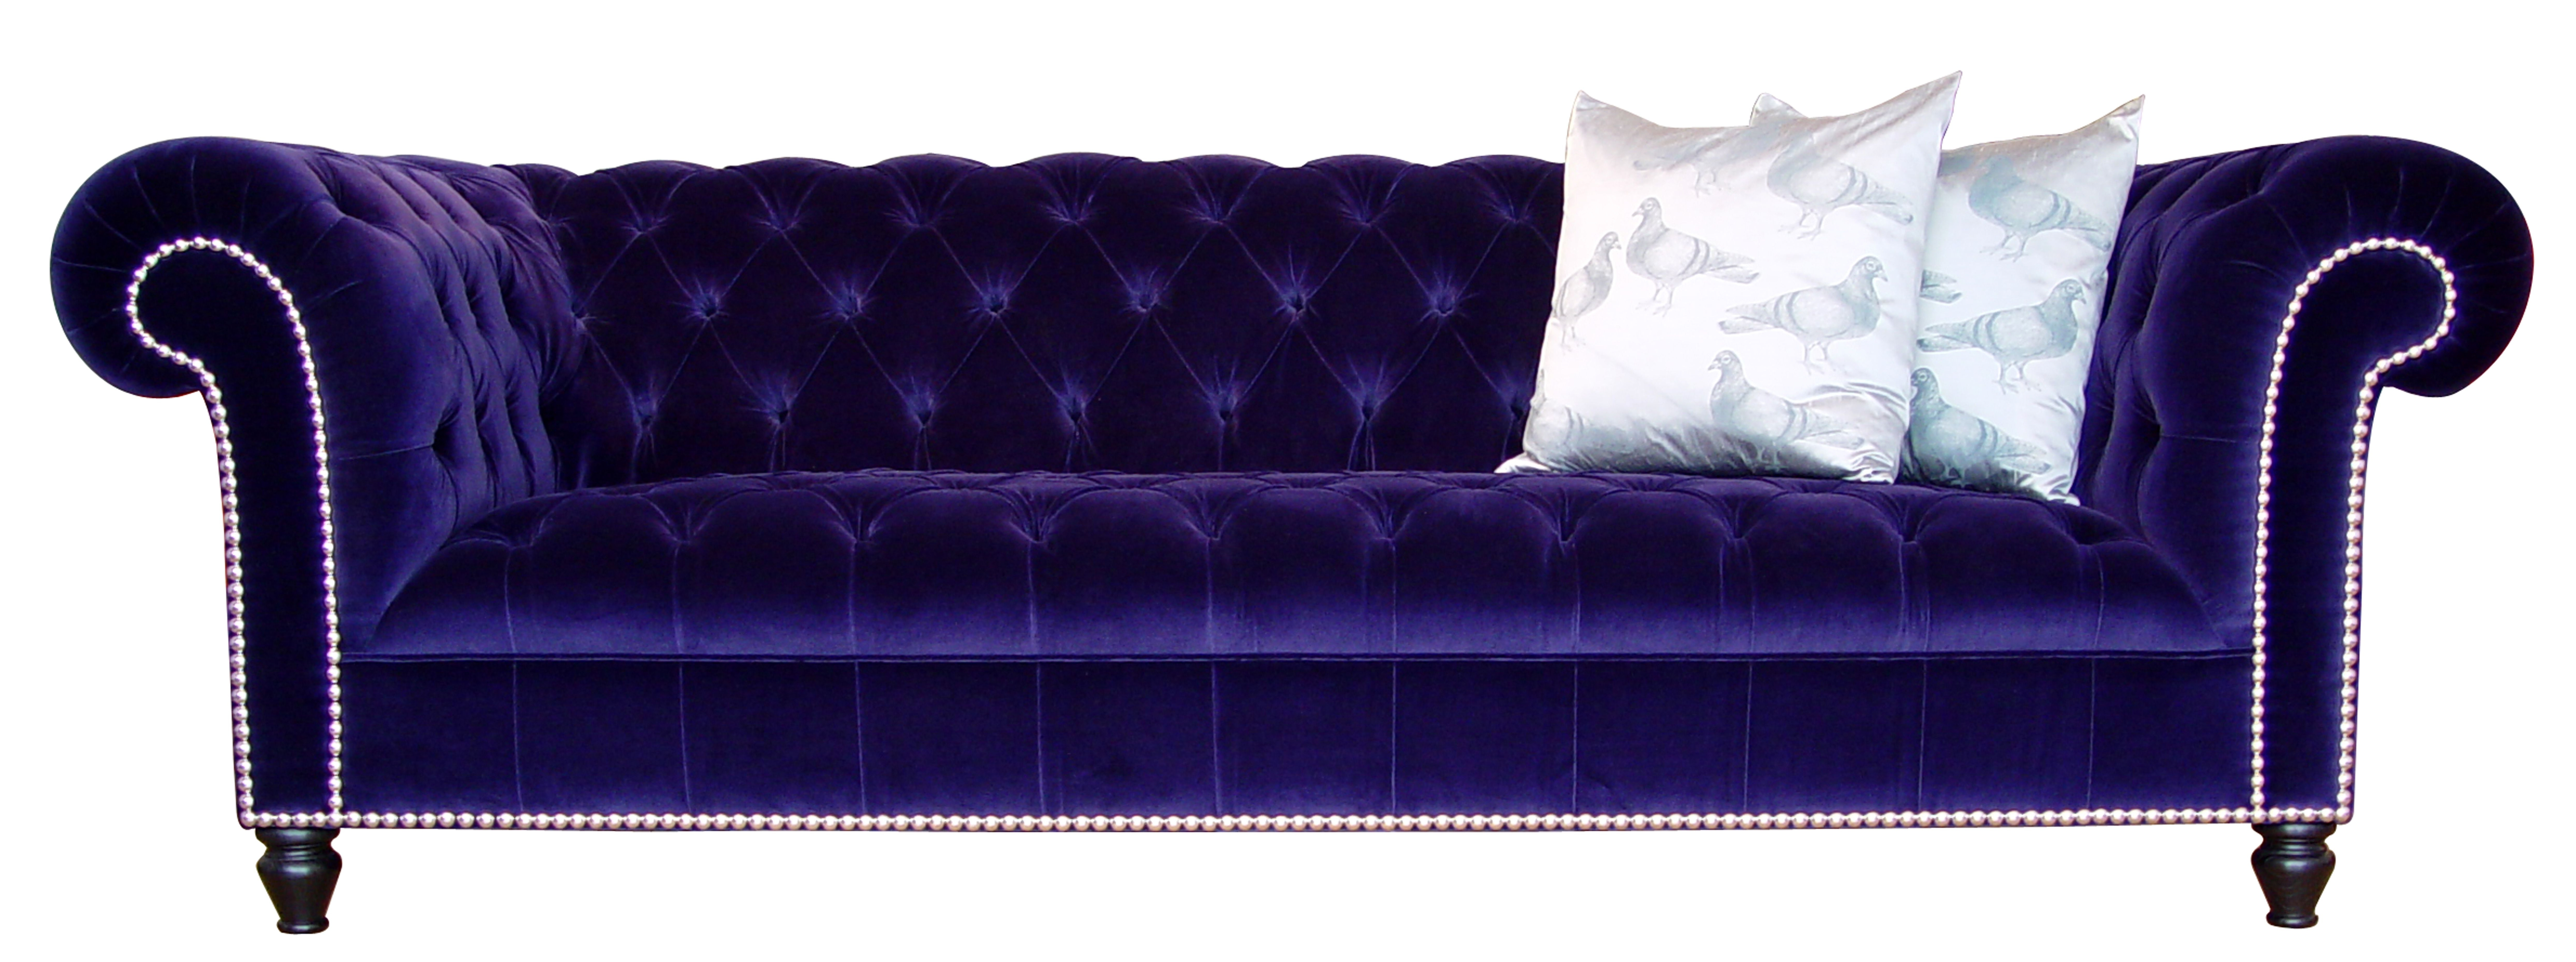 Featured Photo of Velvet Purple Sofas